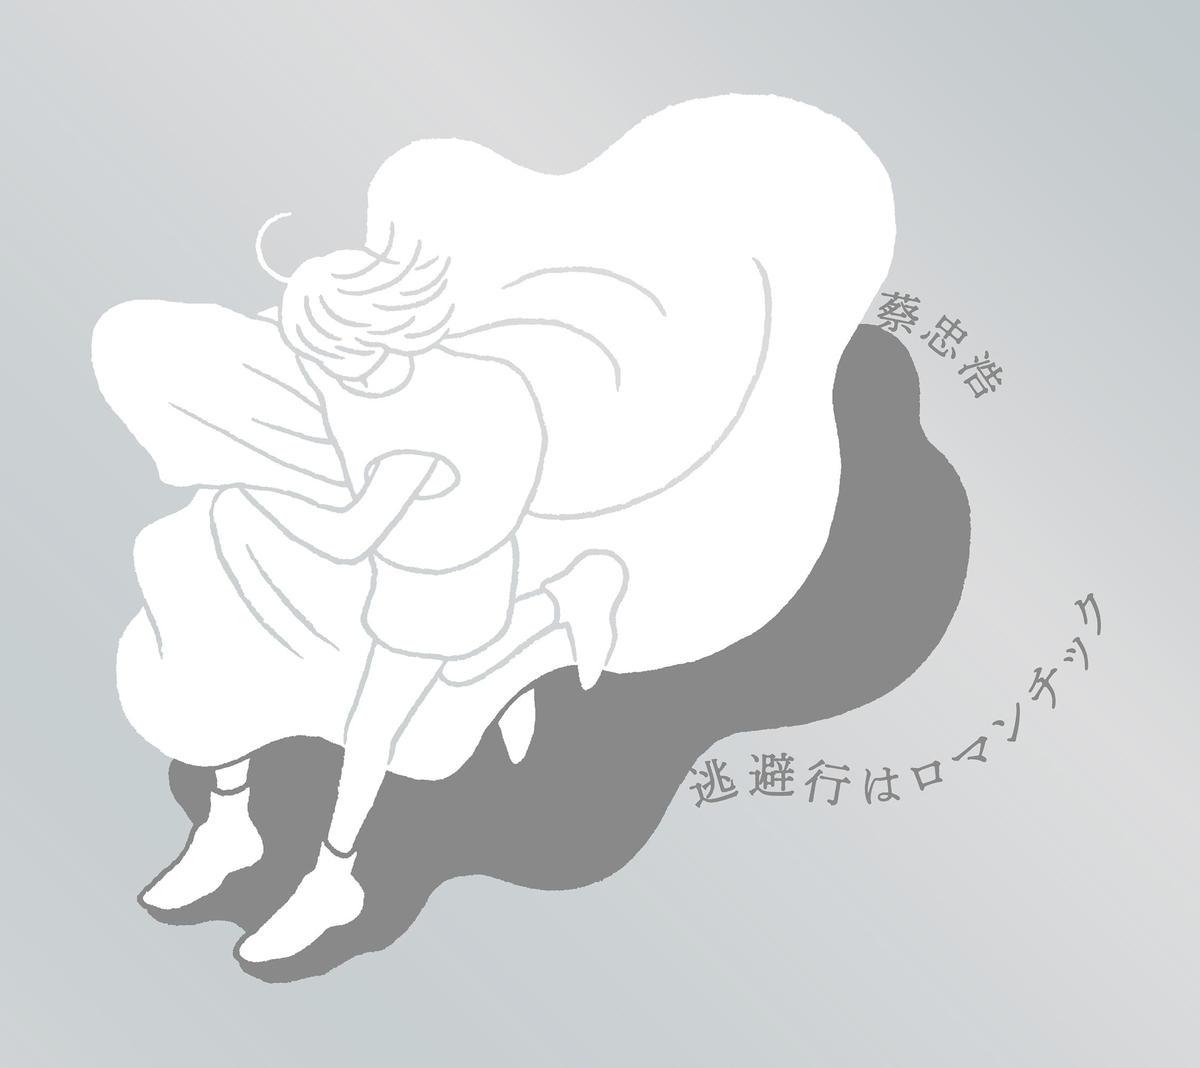 saisolo20_hyo1 (1).jpg